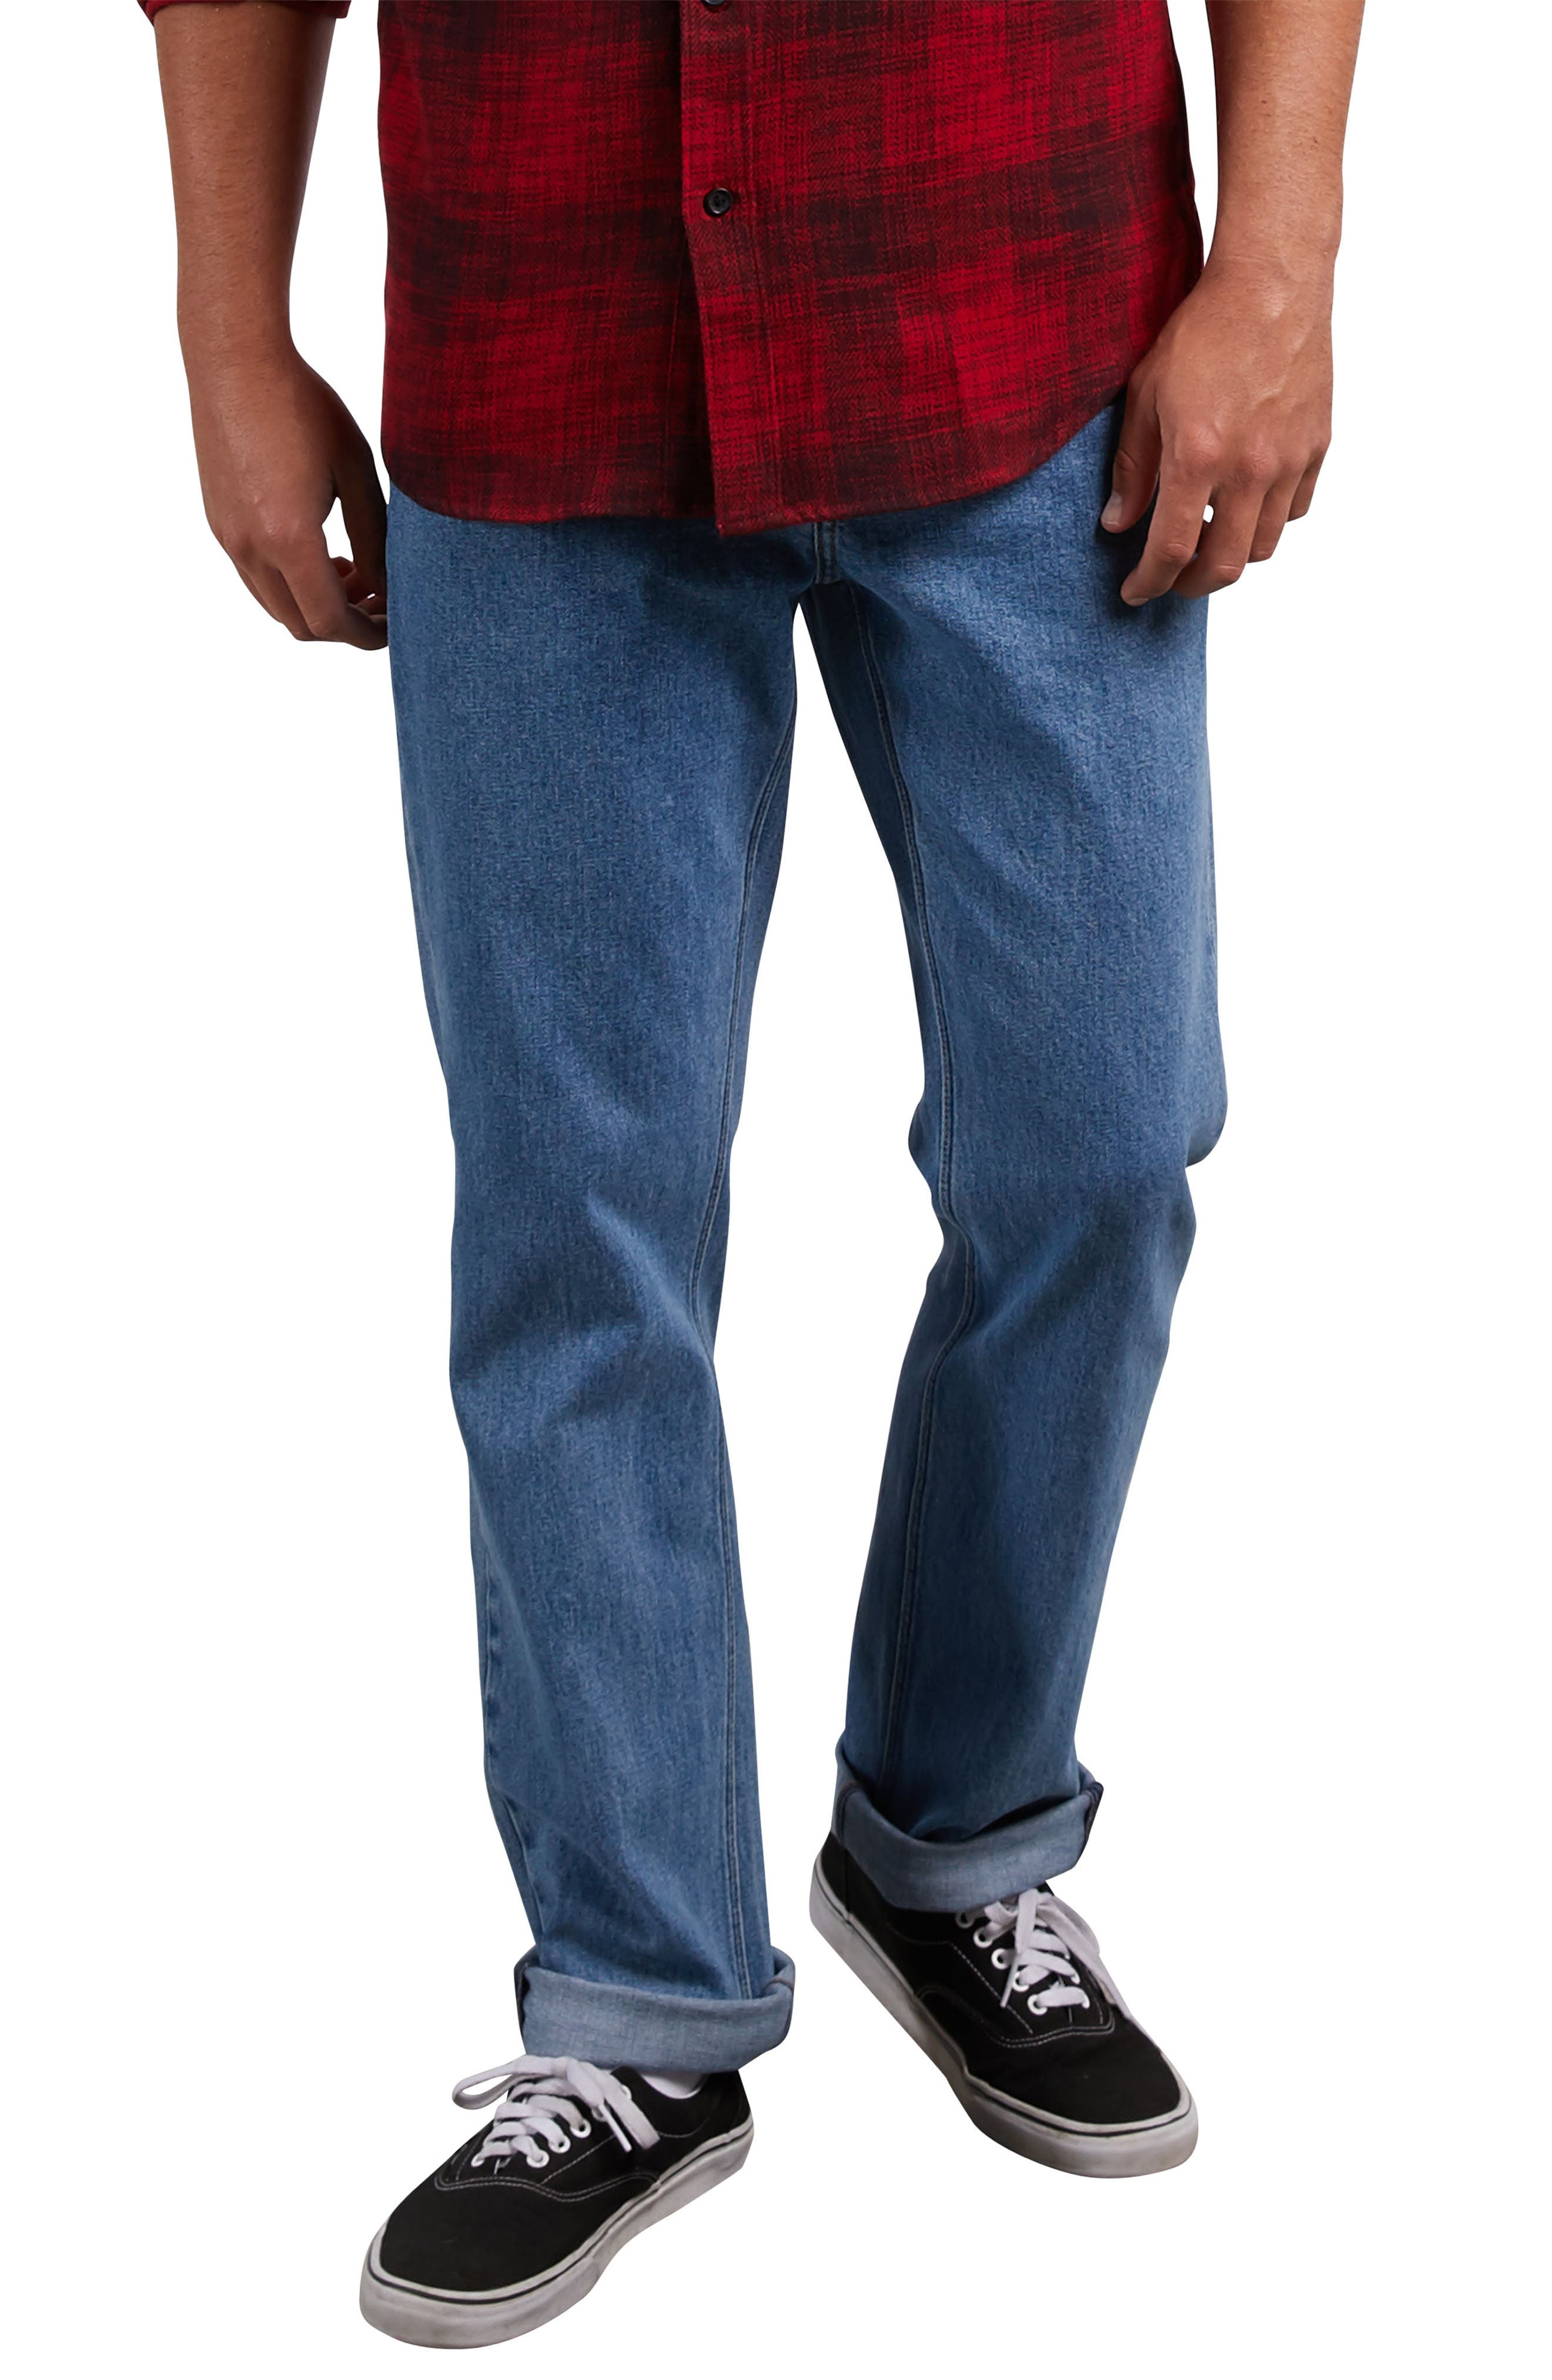 Solver Straight Leg Jeans,                         Main,                         color, STONE BLUE